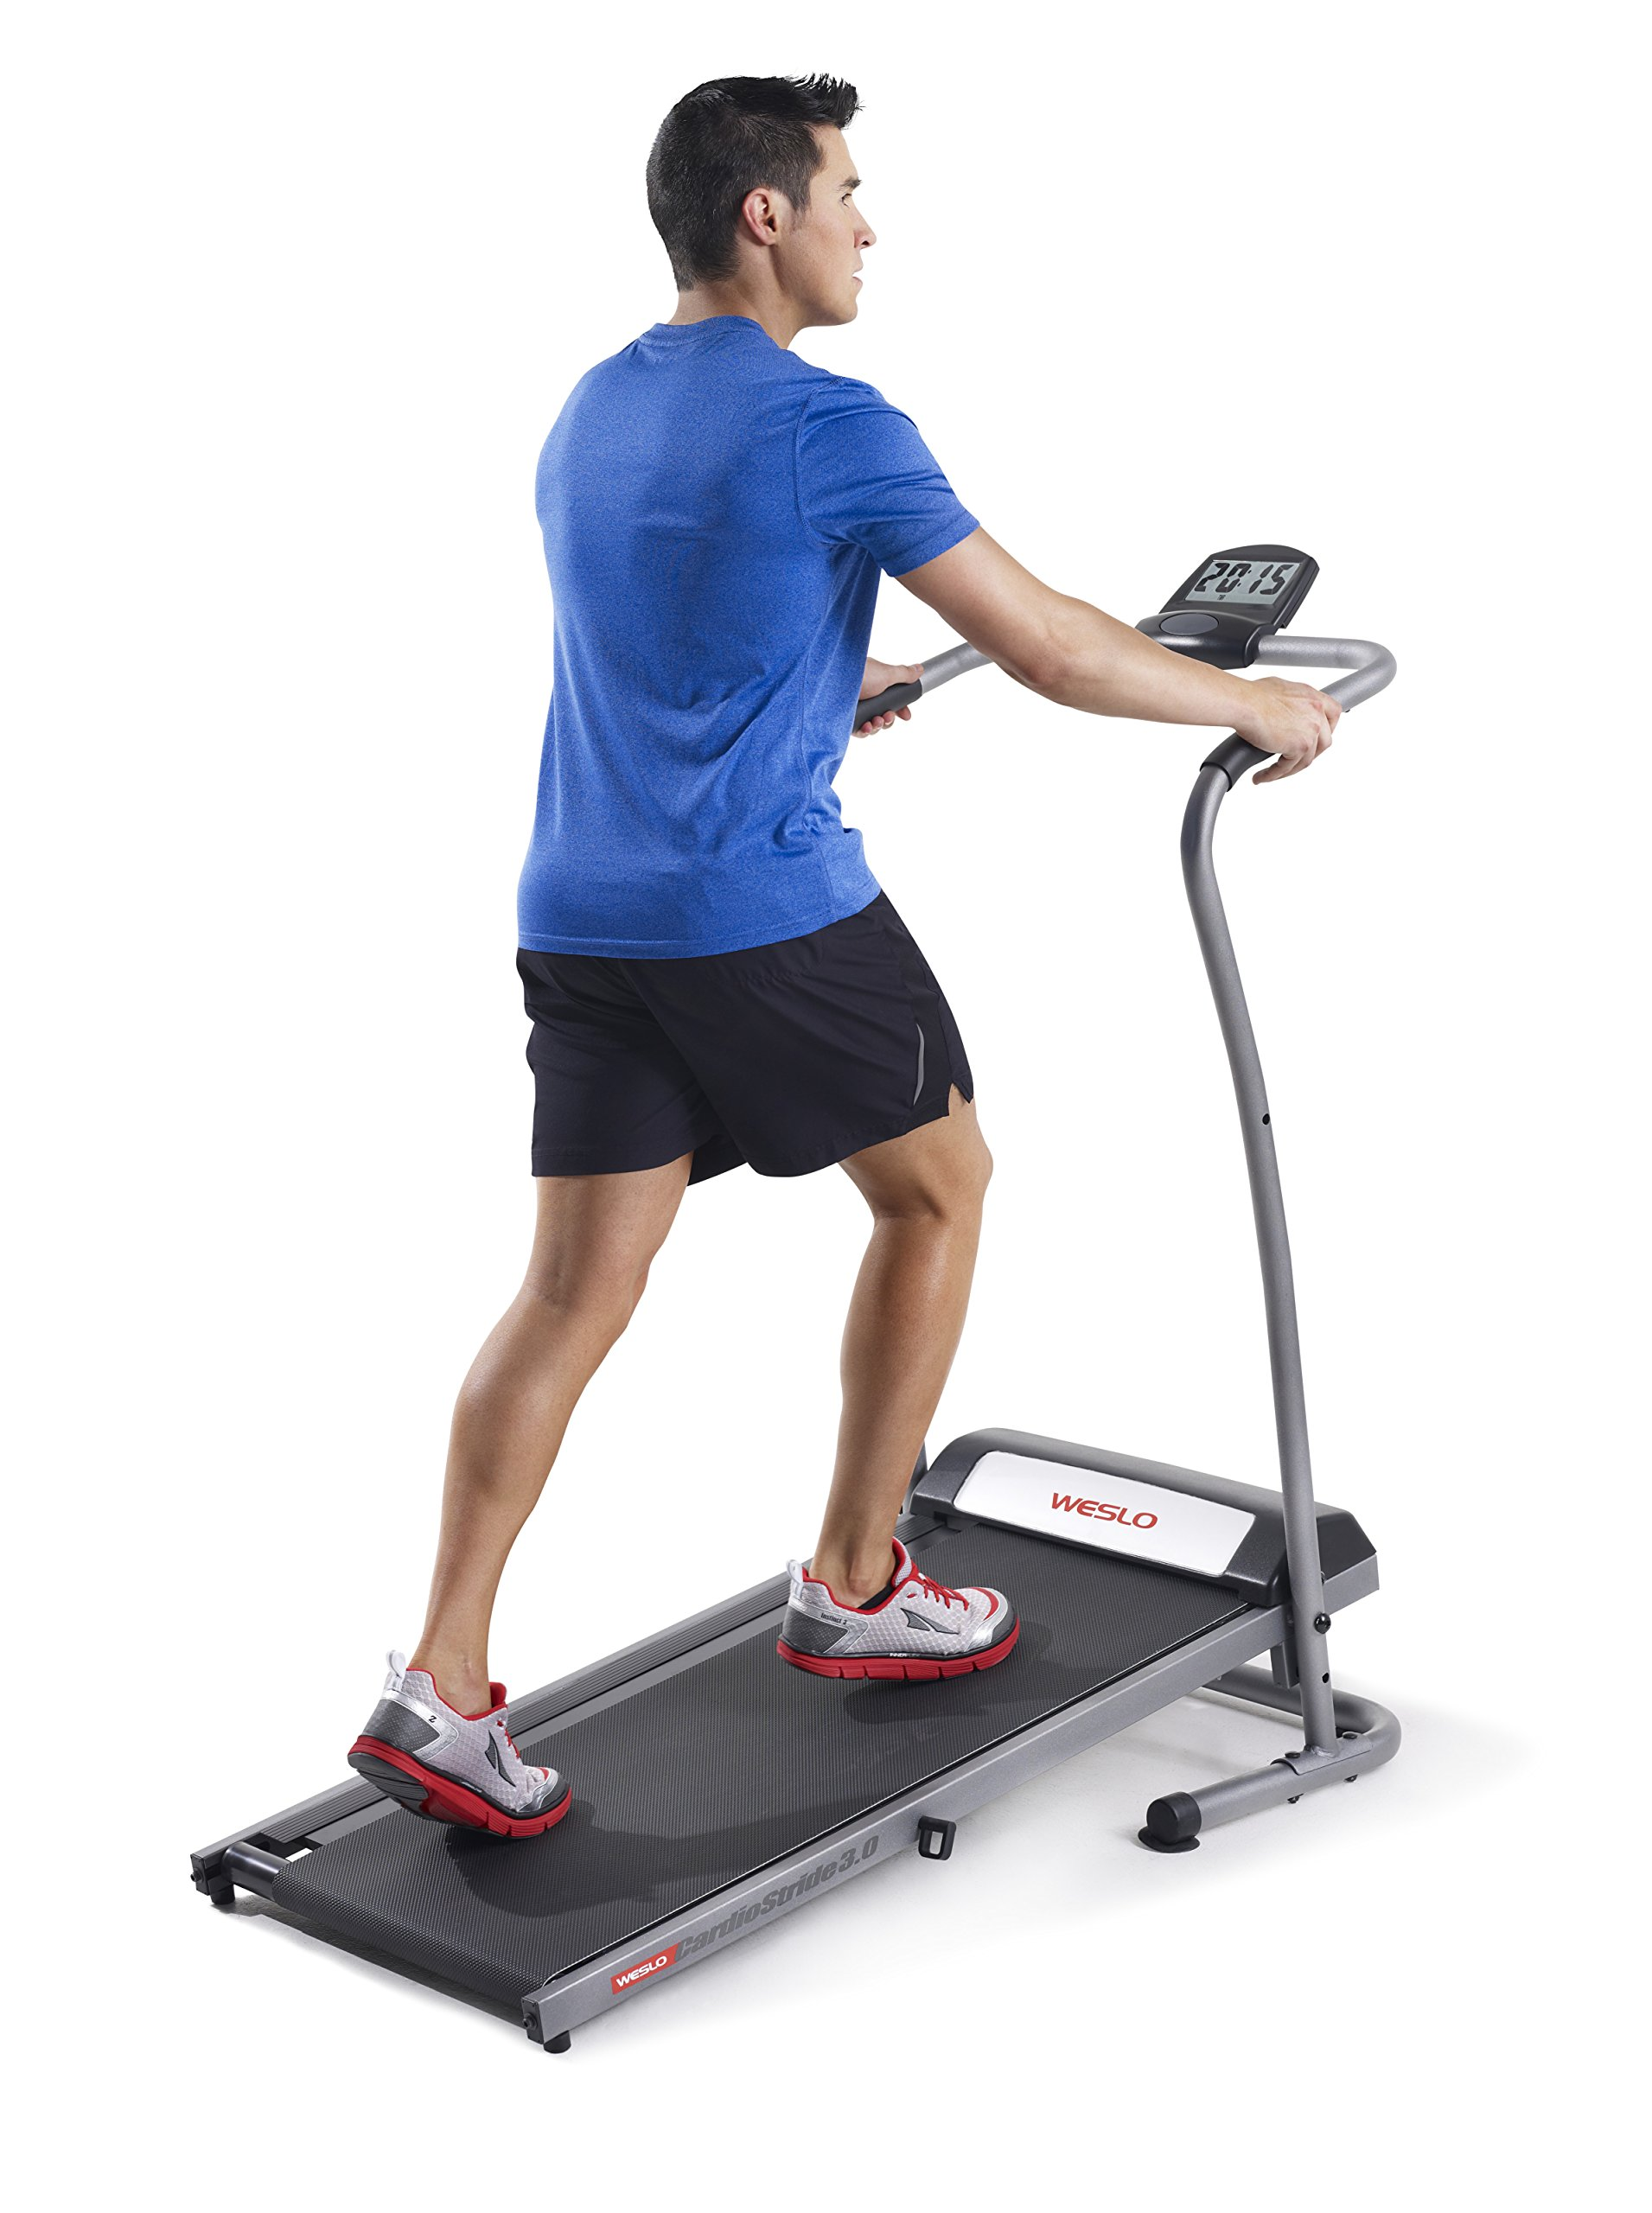 Weslo WLTL99315 CardioStride 3.0 Treadmill by Weslo (Image #11)